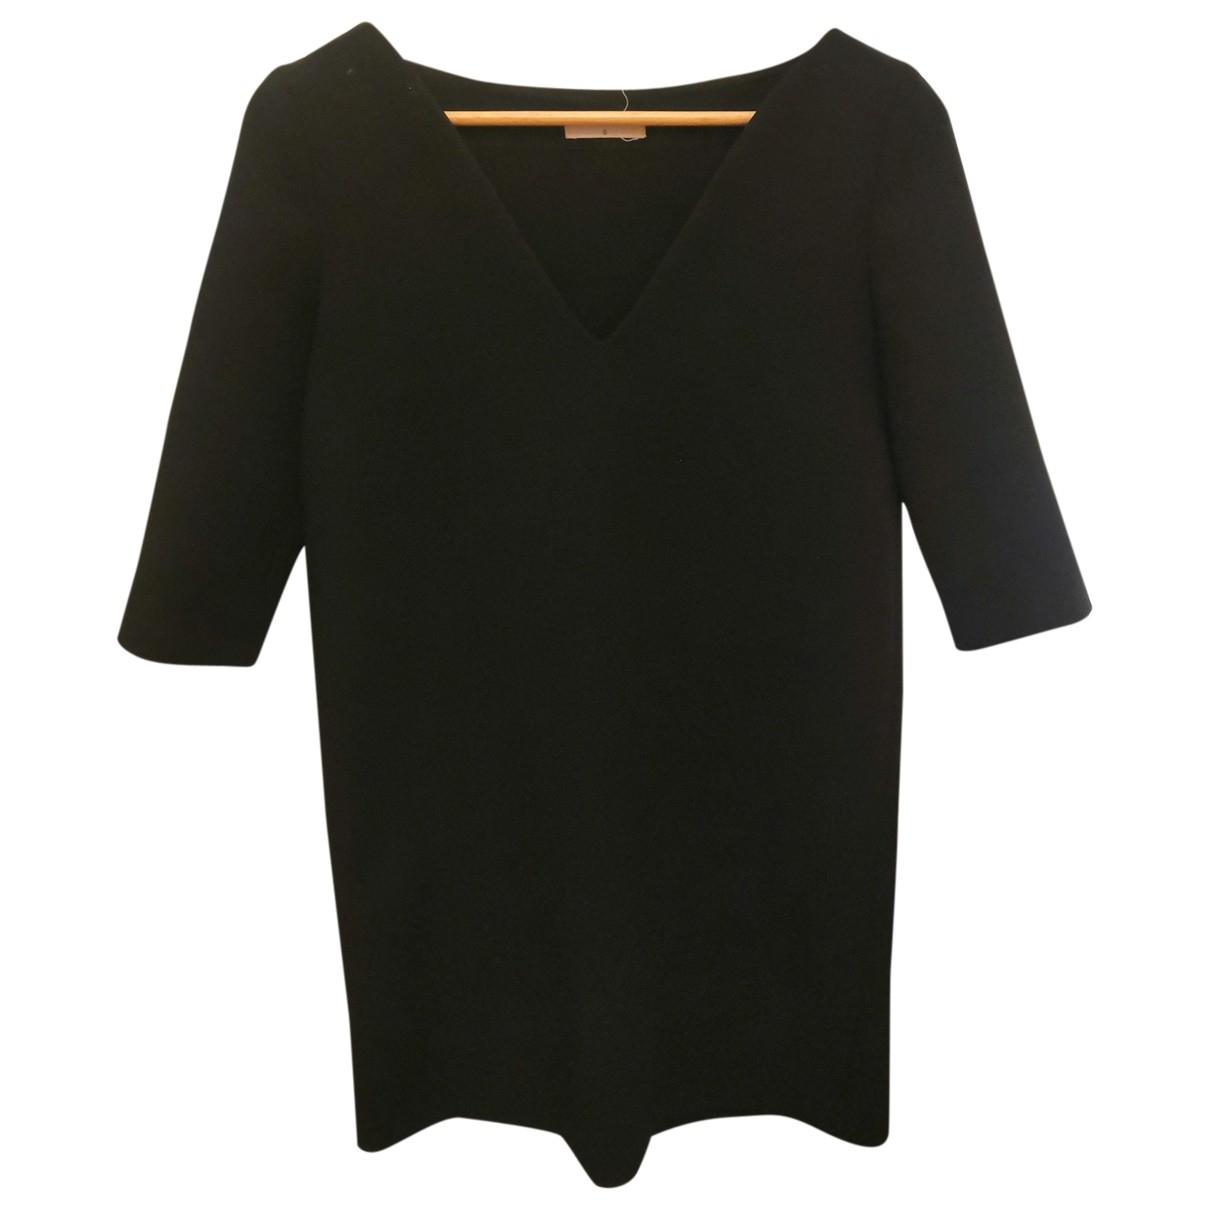 Ba&sh \N Kleid in  Schwarz Polyester